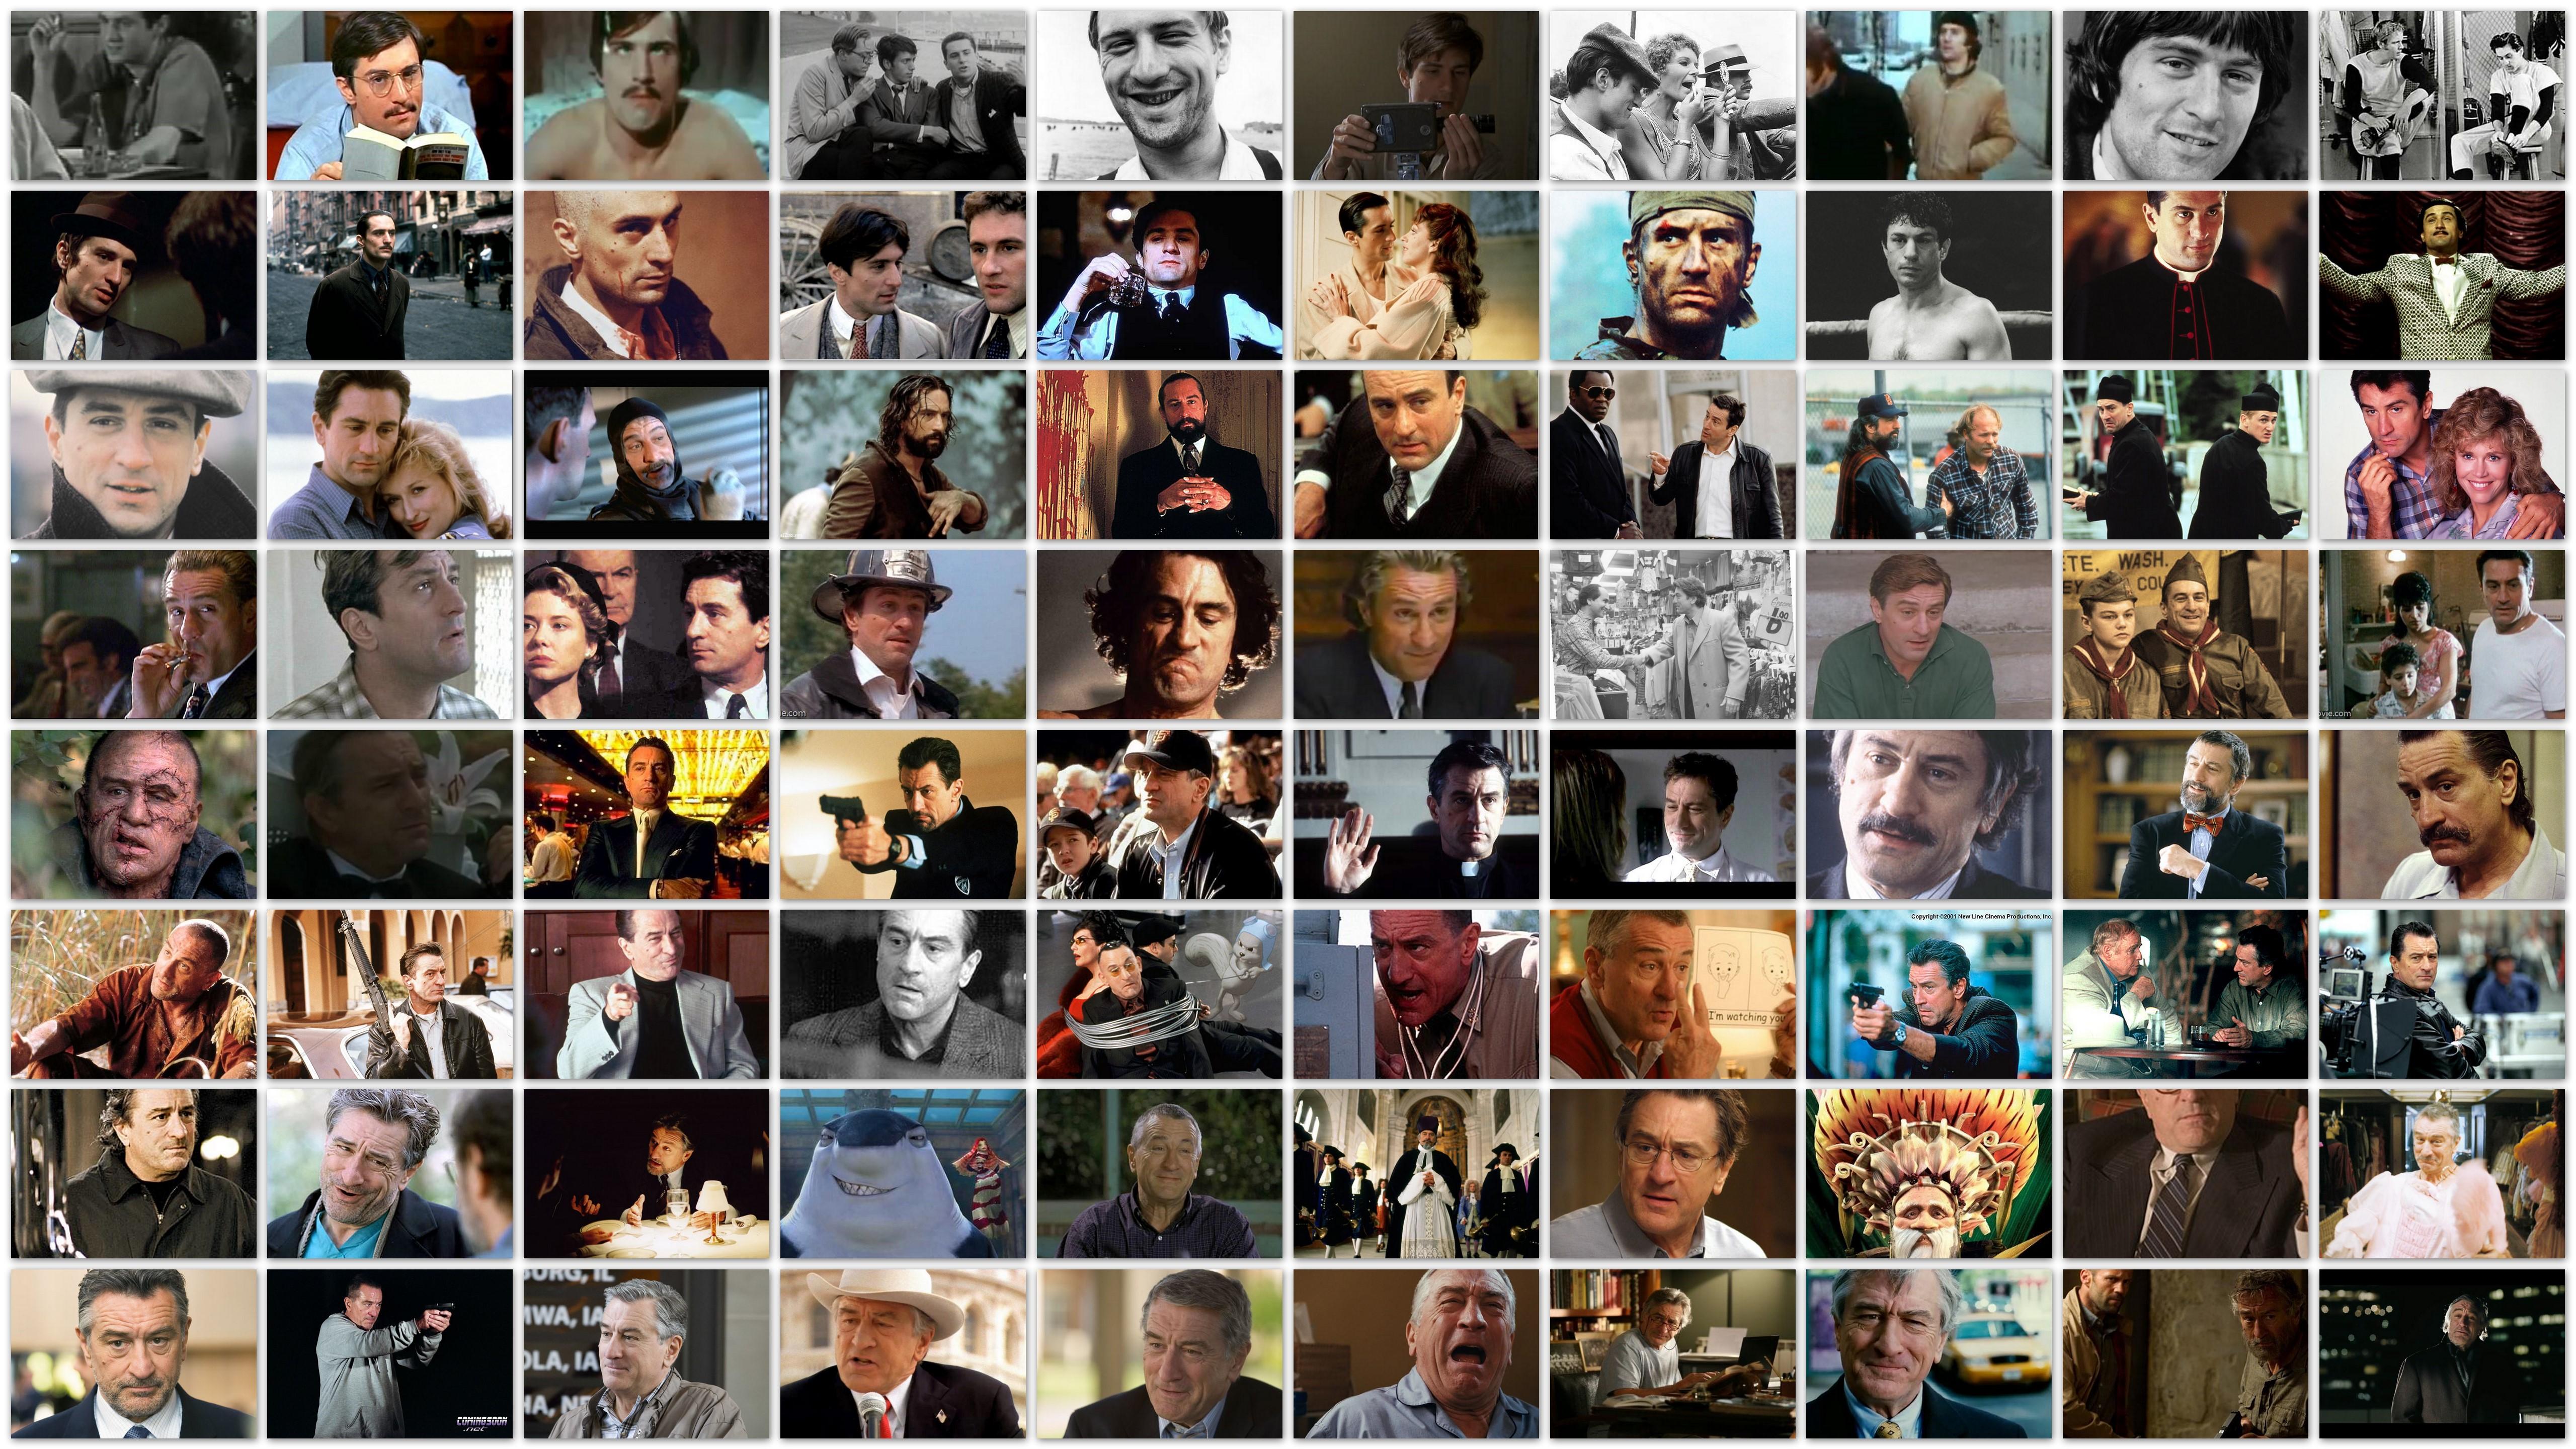 The Many Faces of...Robert de Niro